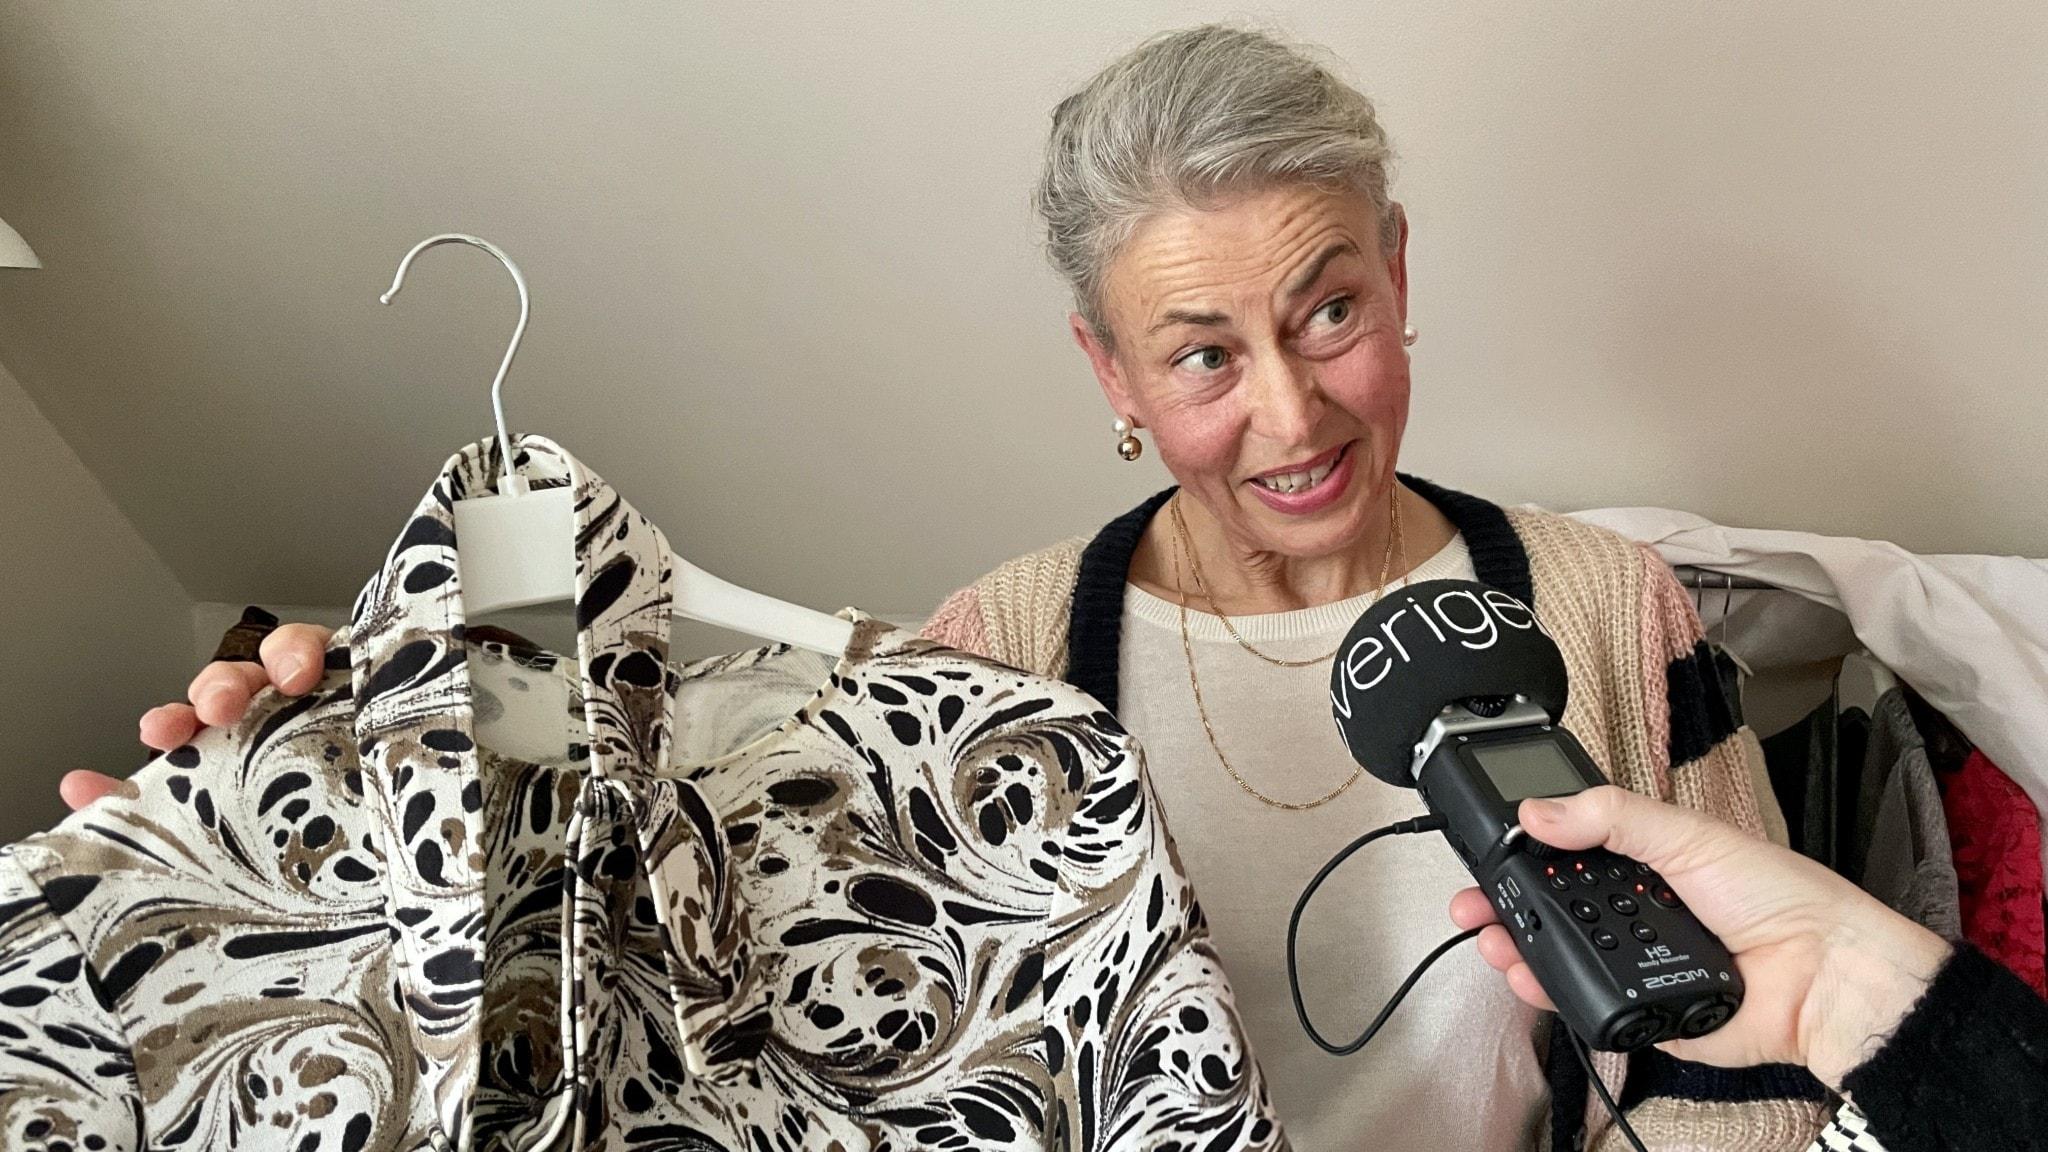 Maria Sörensson, Aging Style, oldfluencer